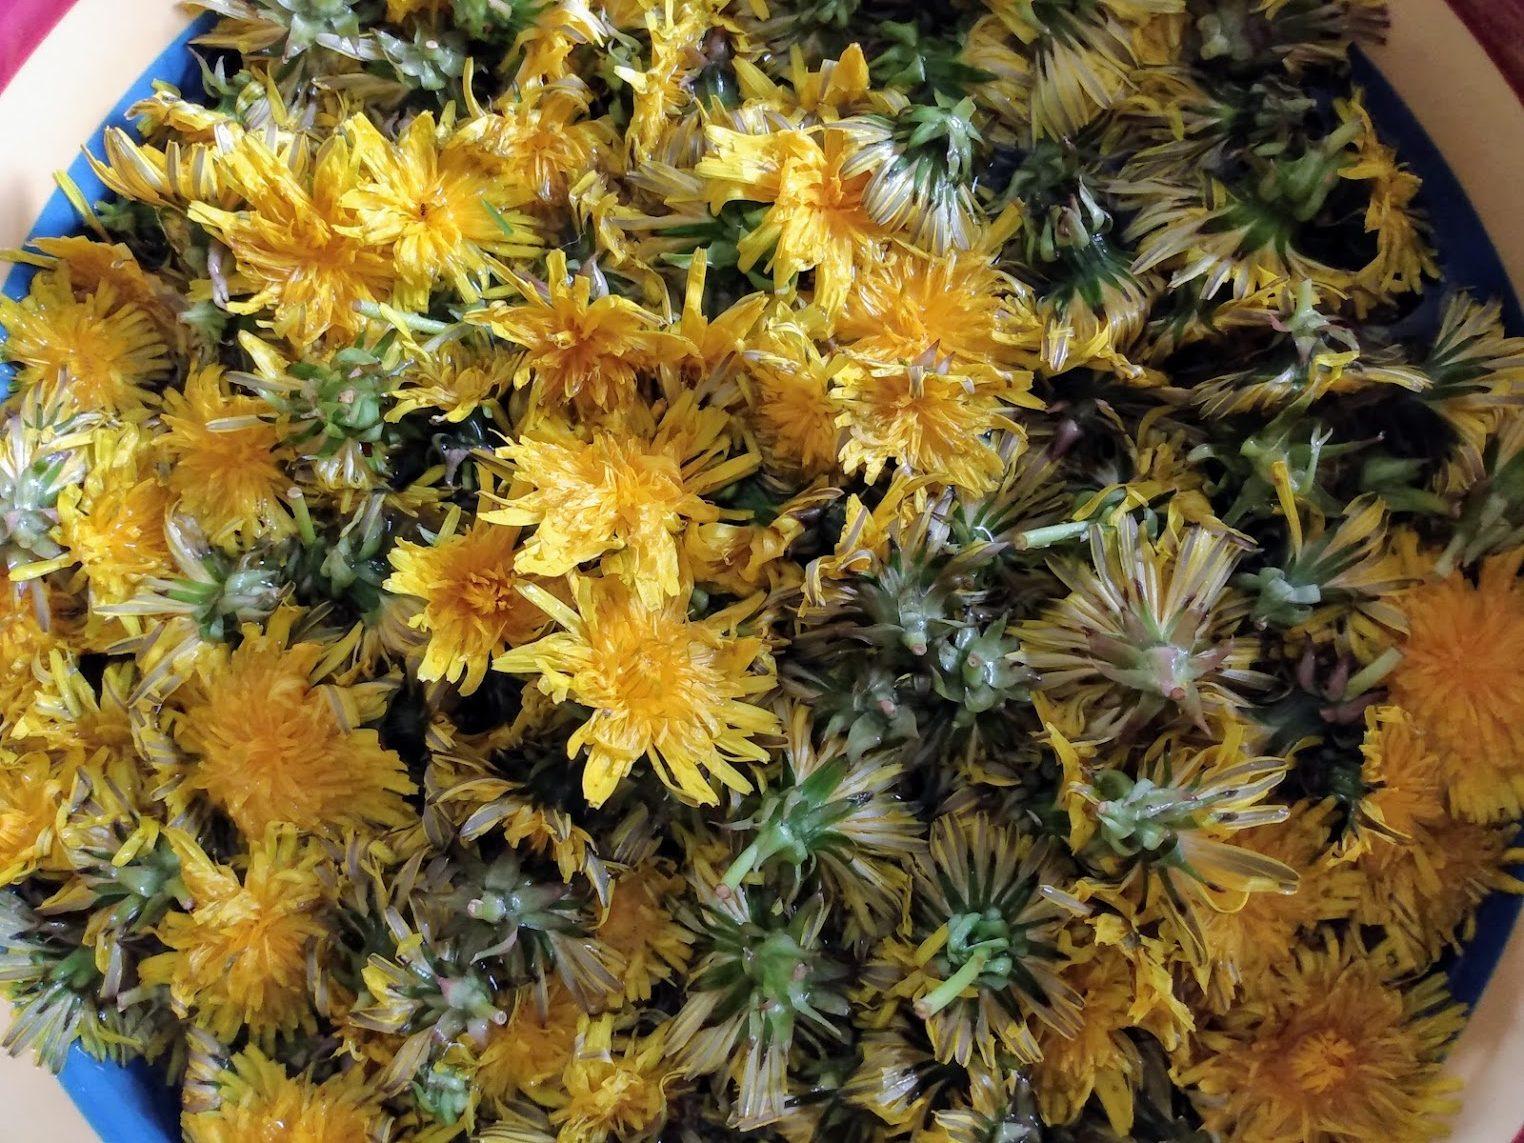 Washing Dandelion Flowers